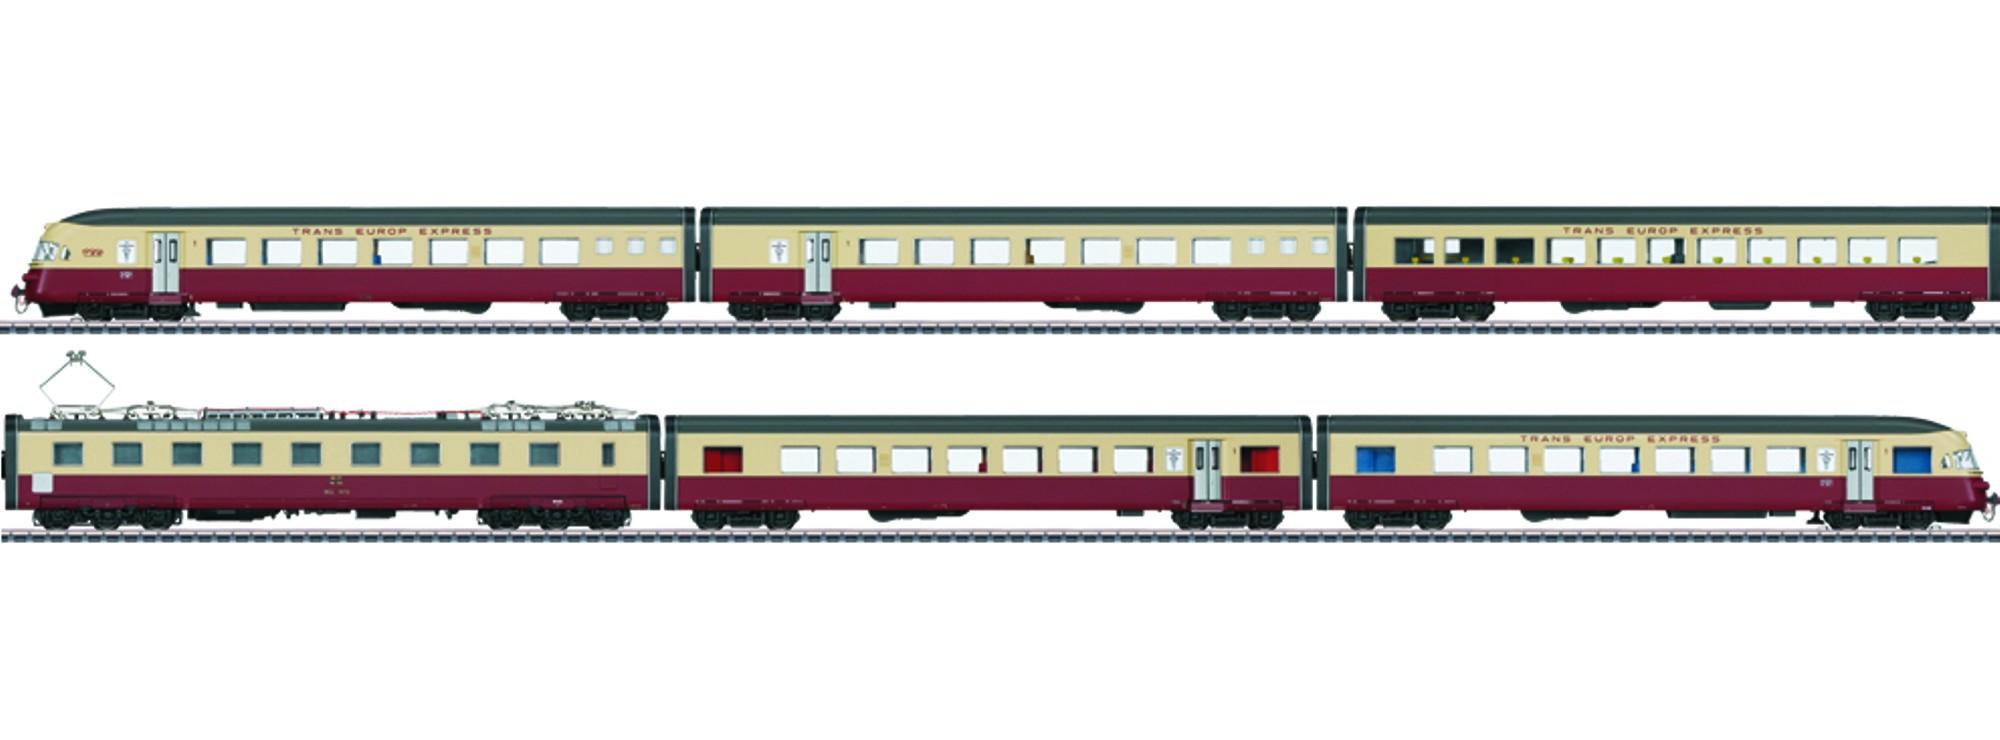 Märklin 37547 Sbb Elektro Triebwagenzug Rae Tee 1052 Cisalpin